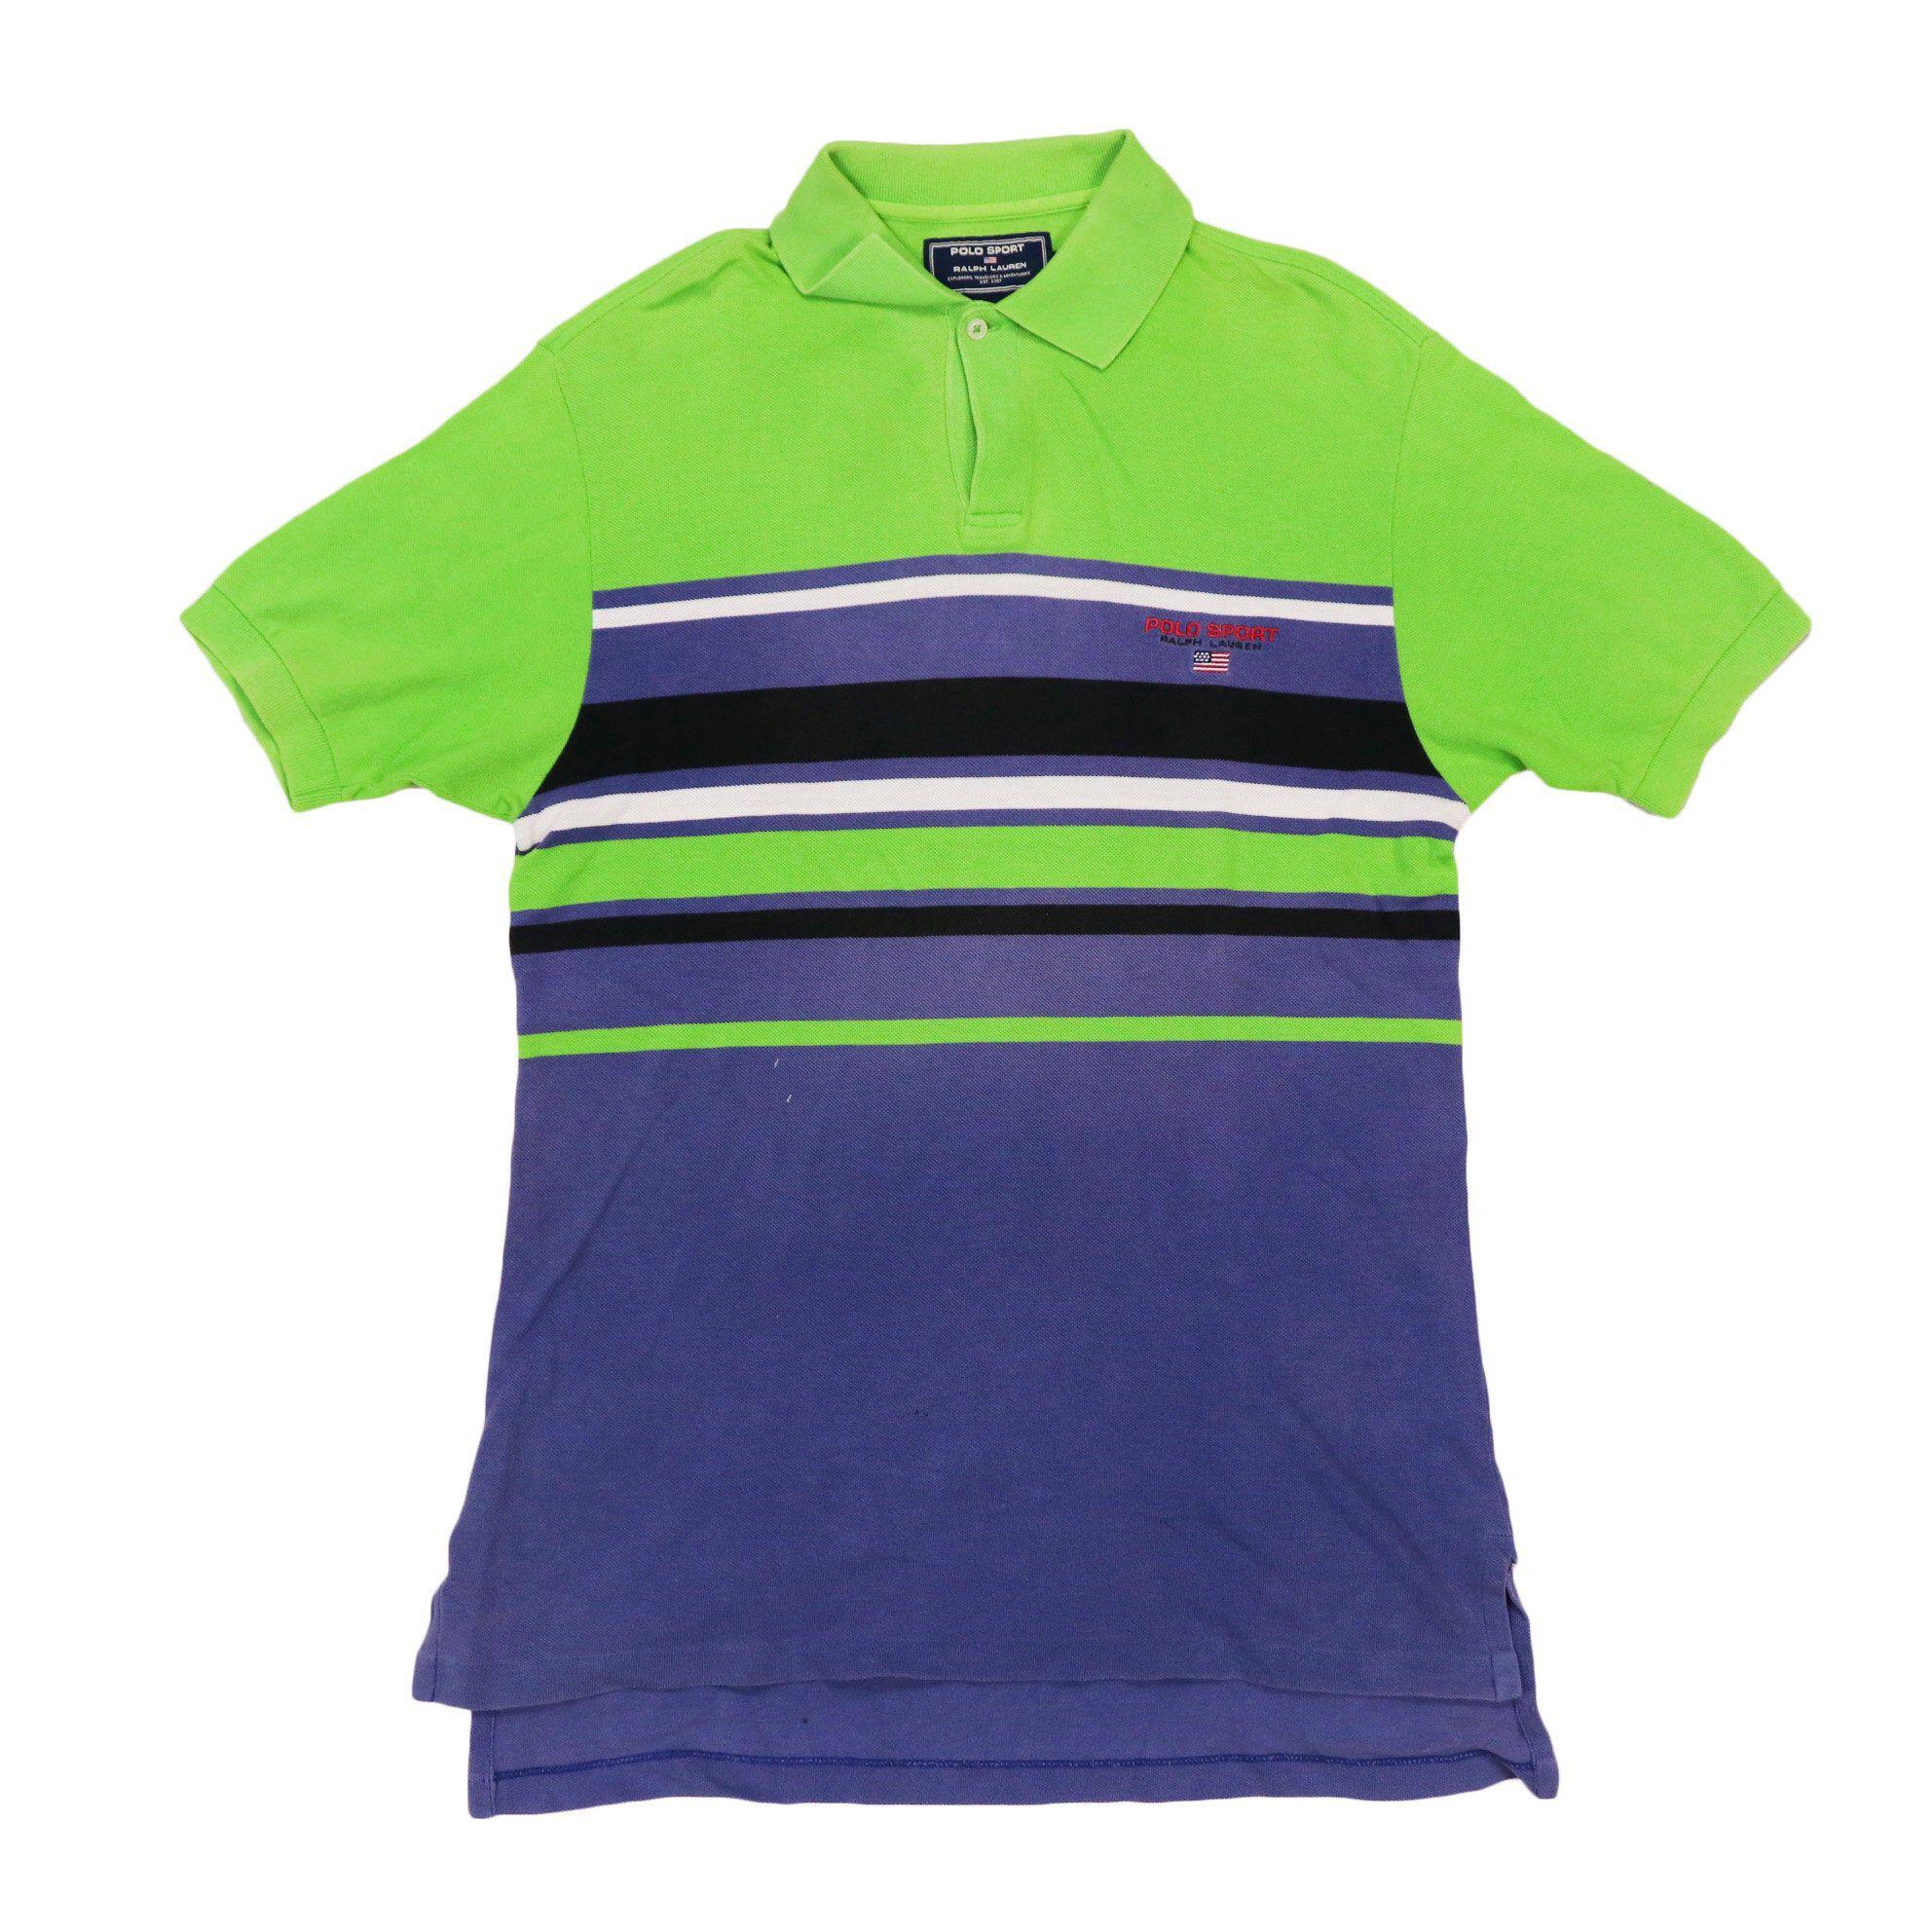 Vintage polo sport Striped Polos Shirt Size